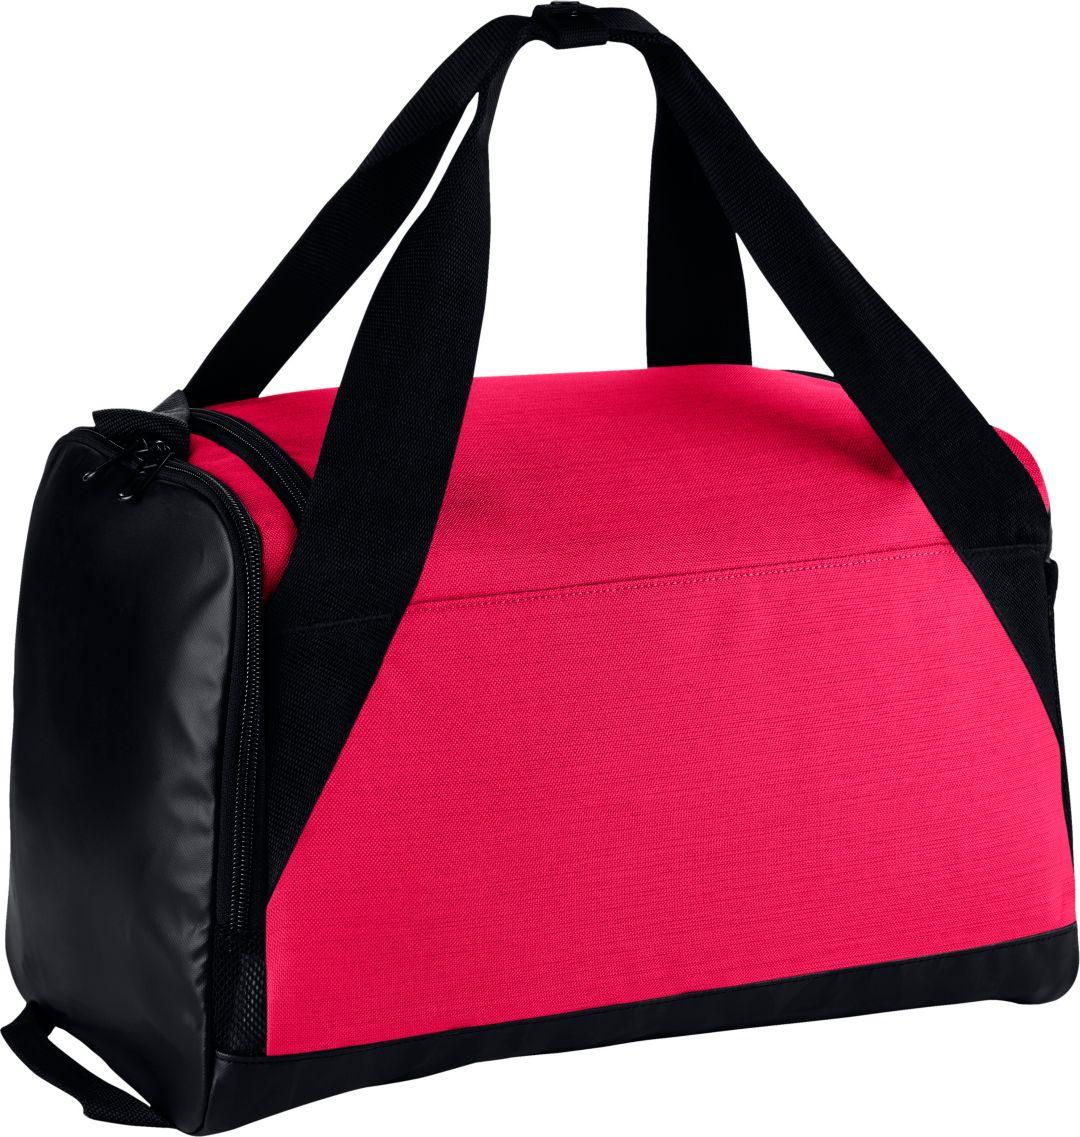 767619bc637030 Nike Brasilia 8 X-Small Duffle Bag. noImageFound. Previous. 1. 2